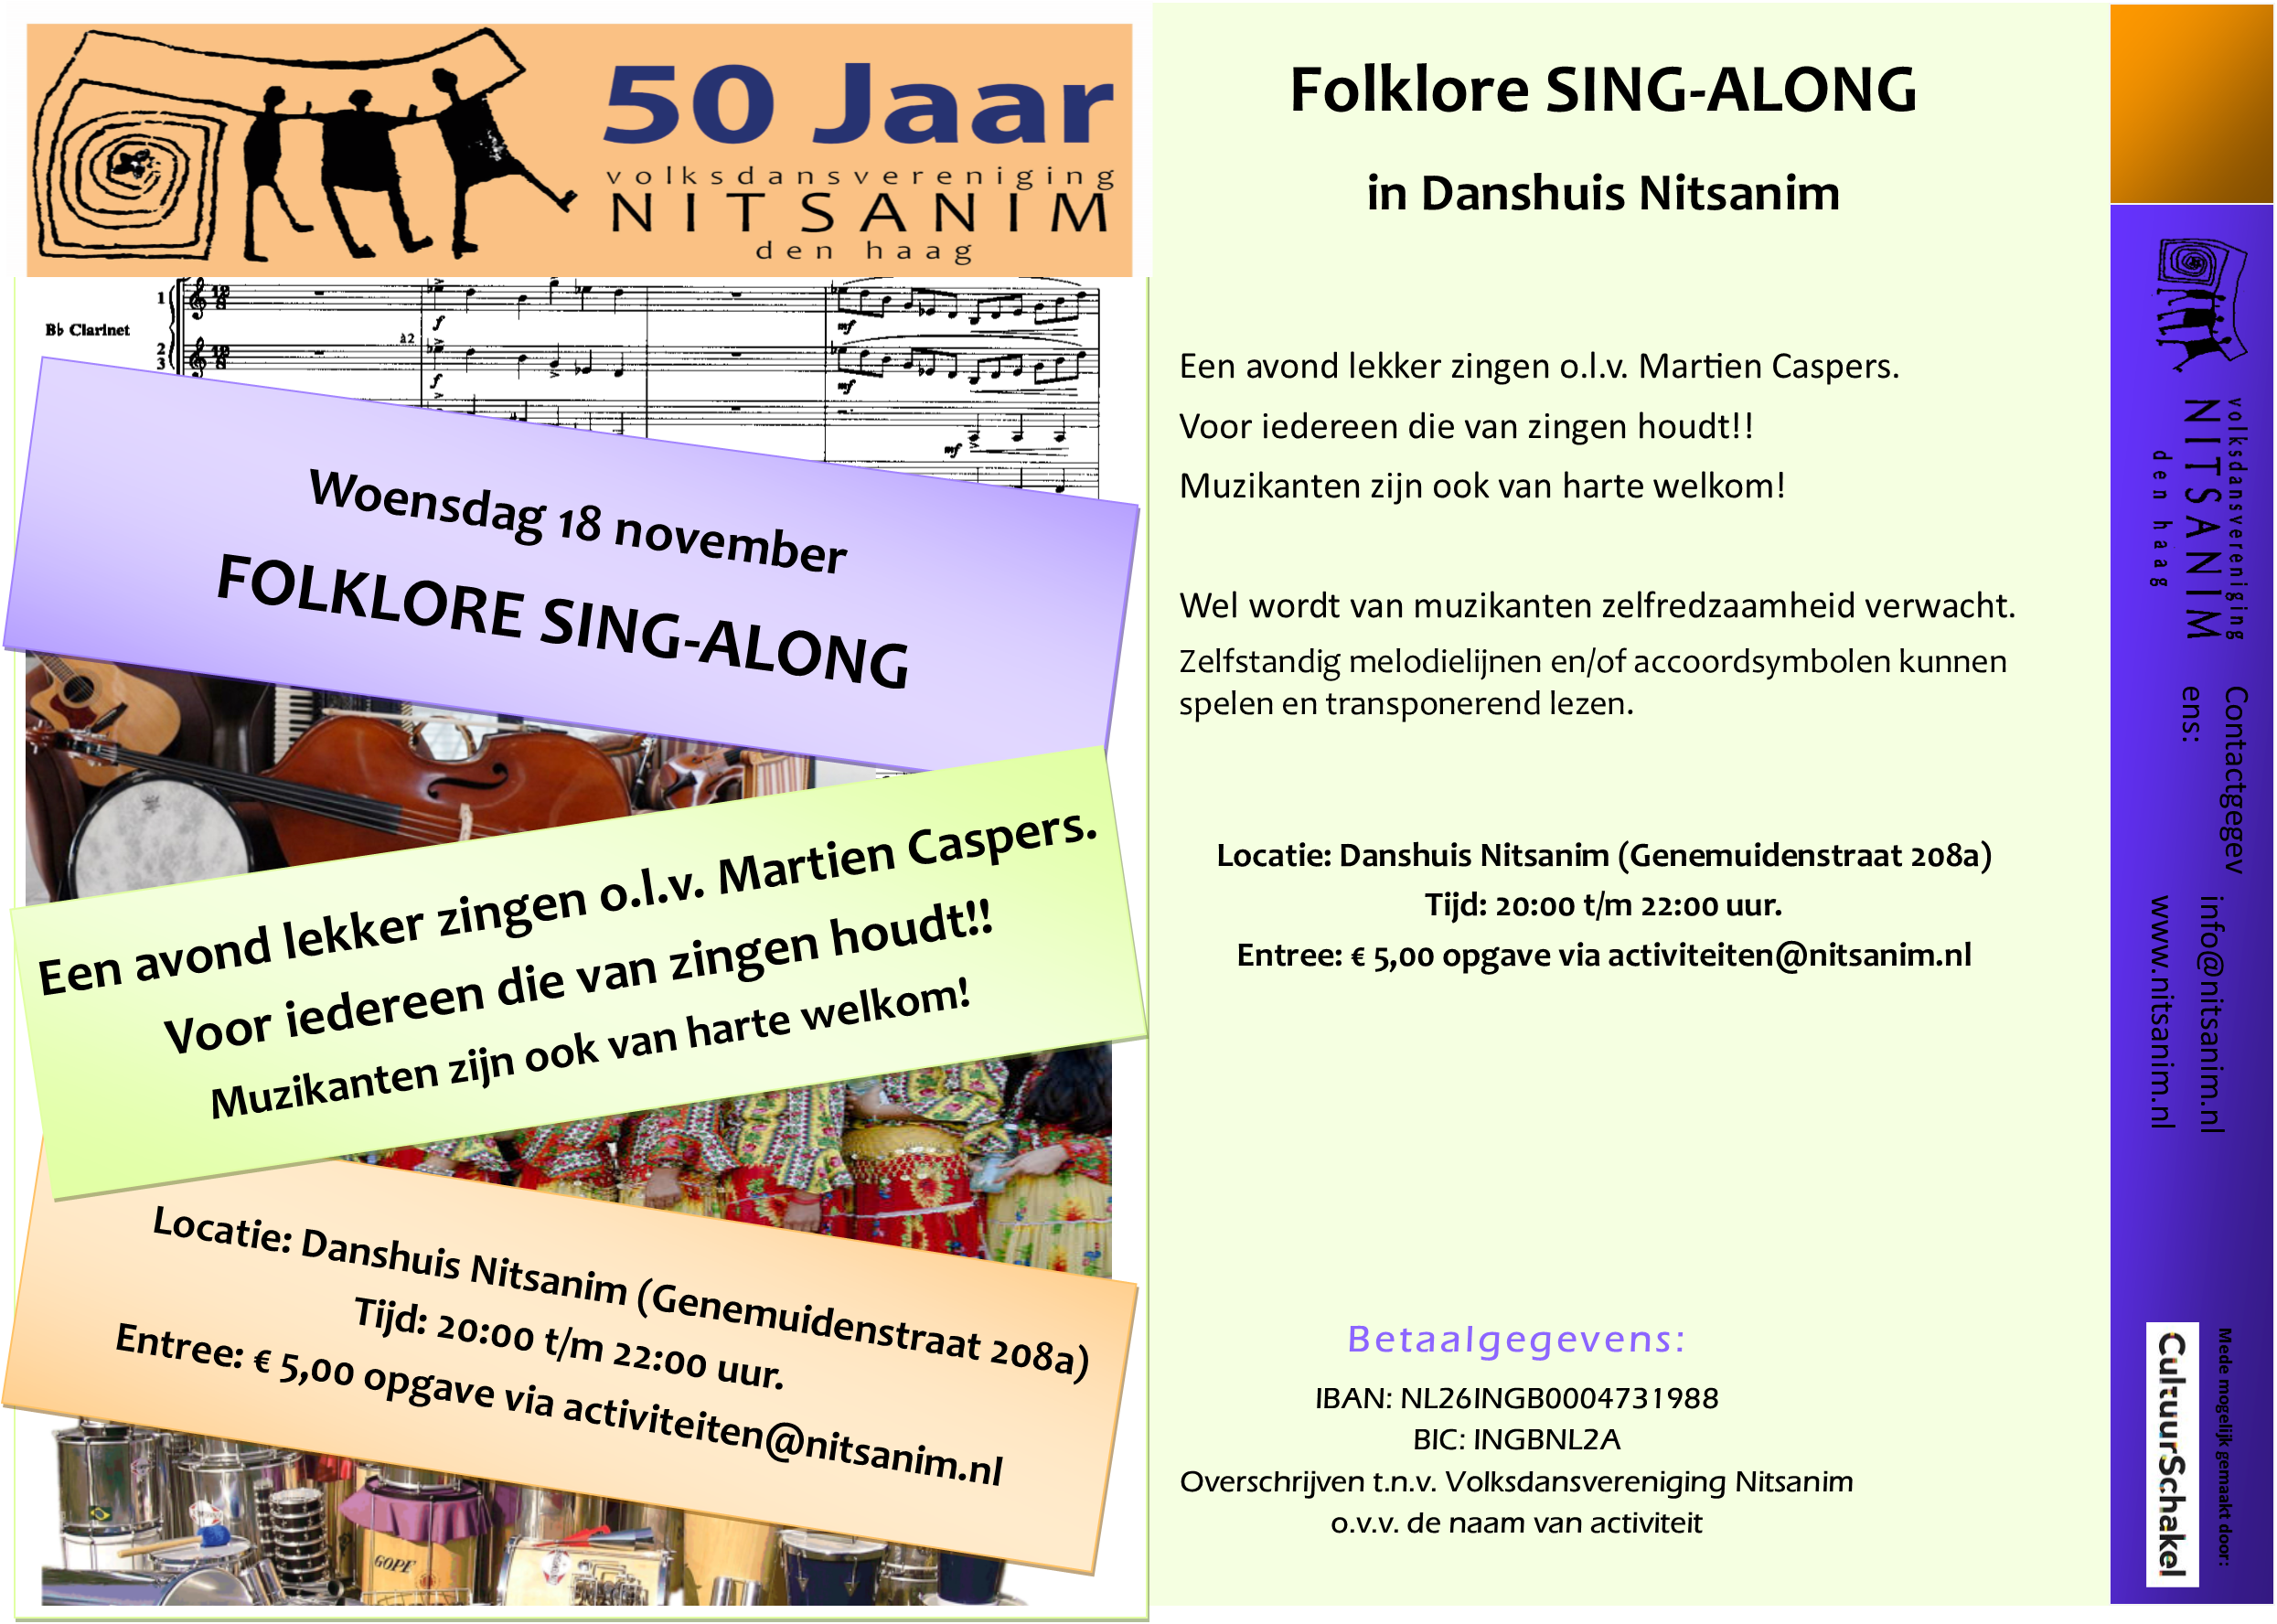 2015-10-18 Jubileum Sing-along flyerv3